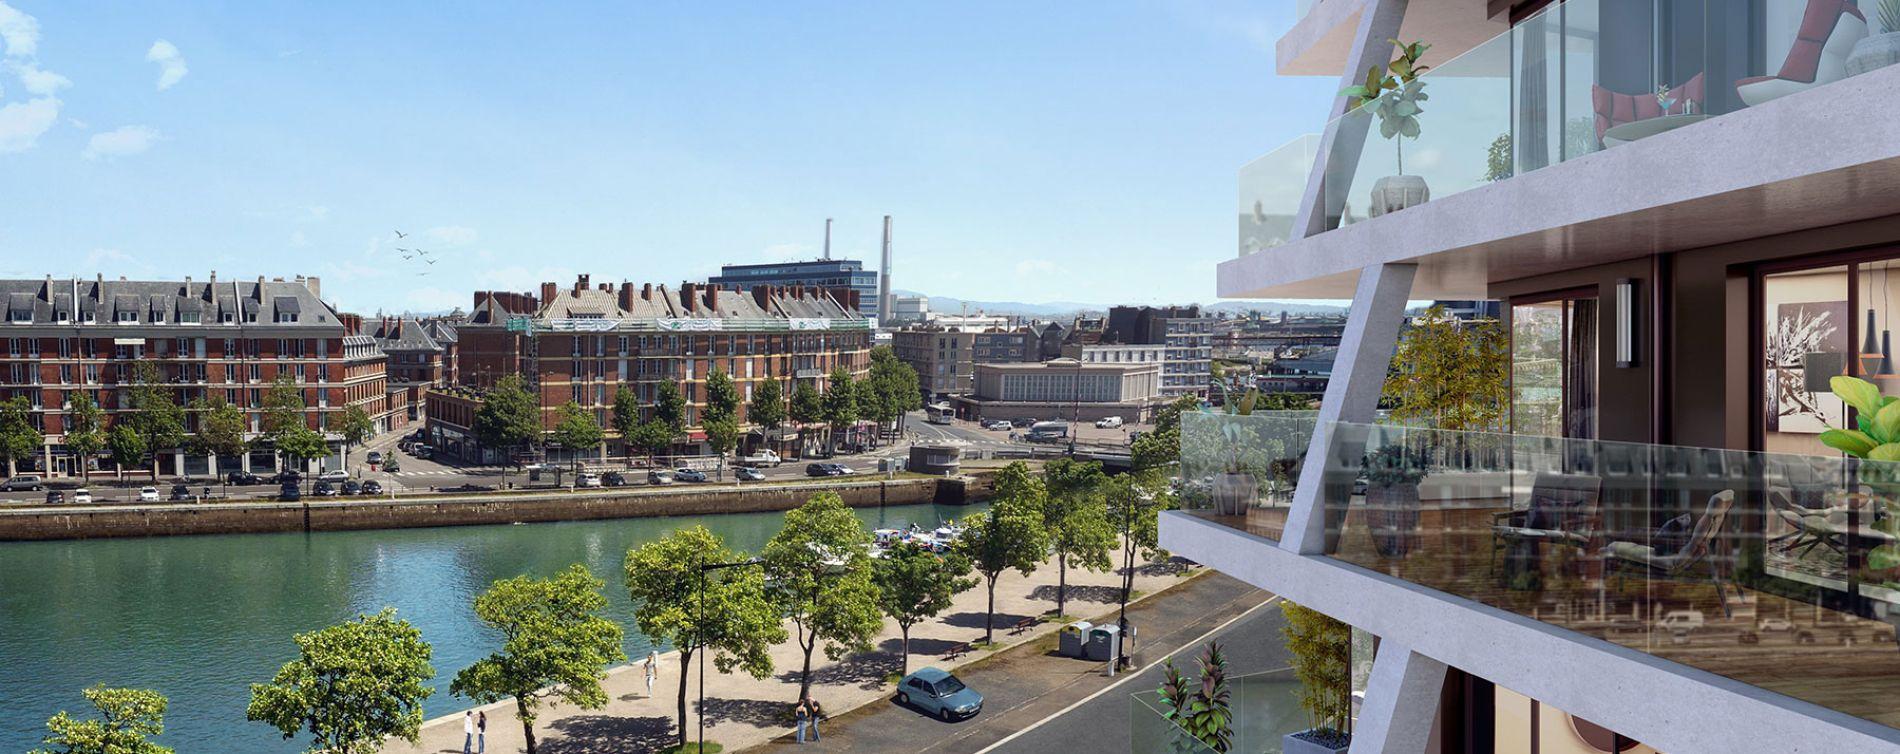 Résidence Alta au Havre